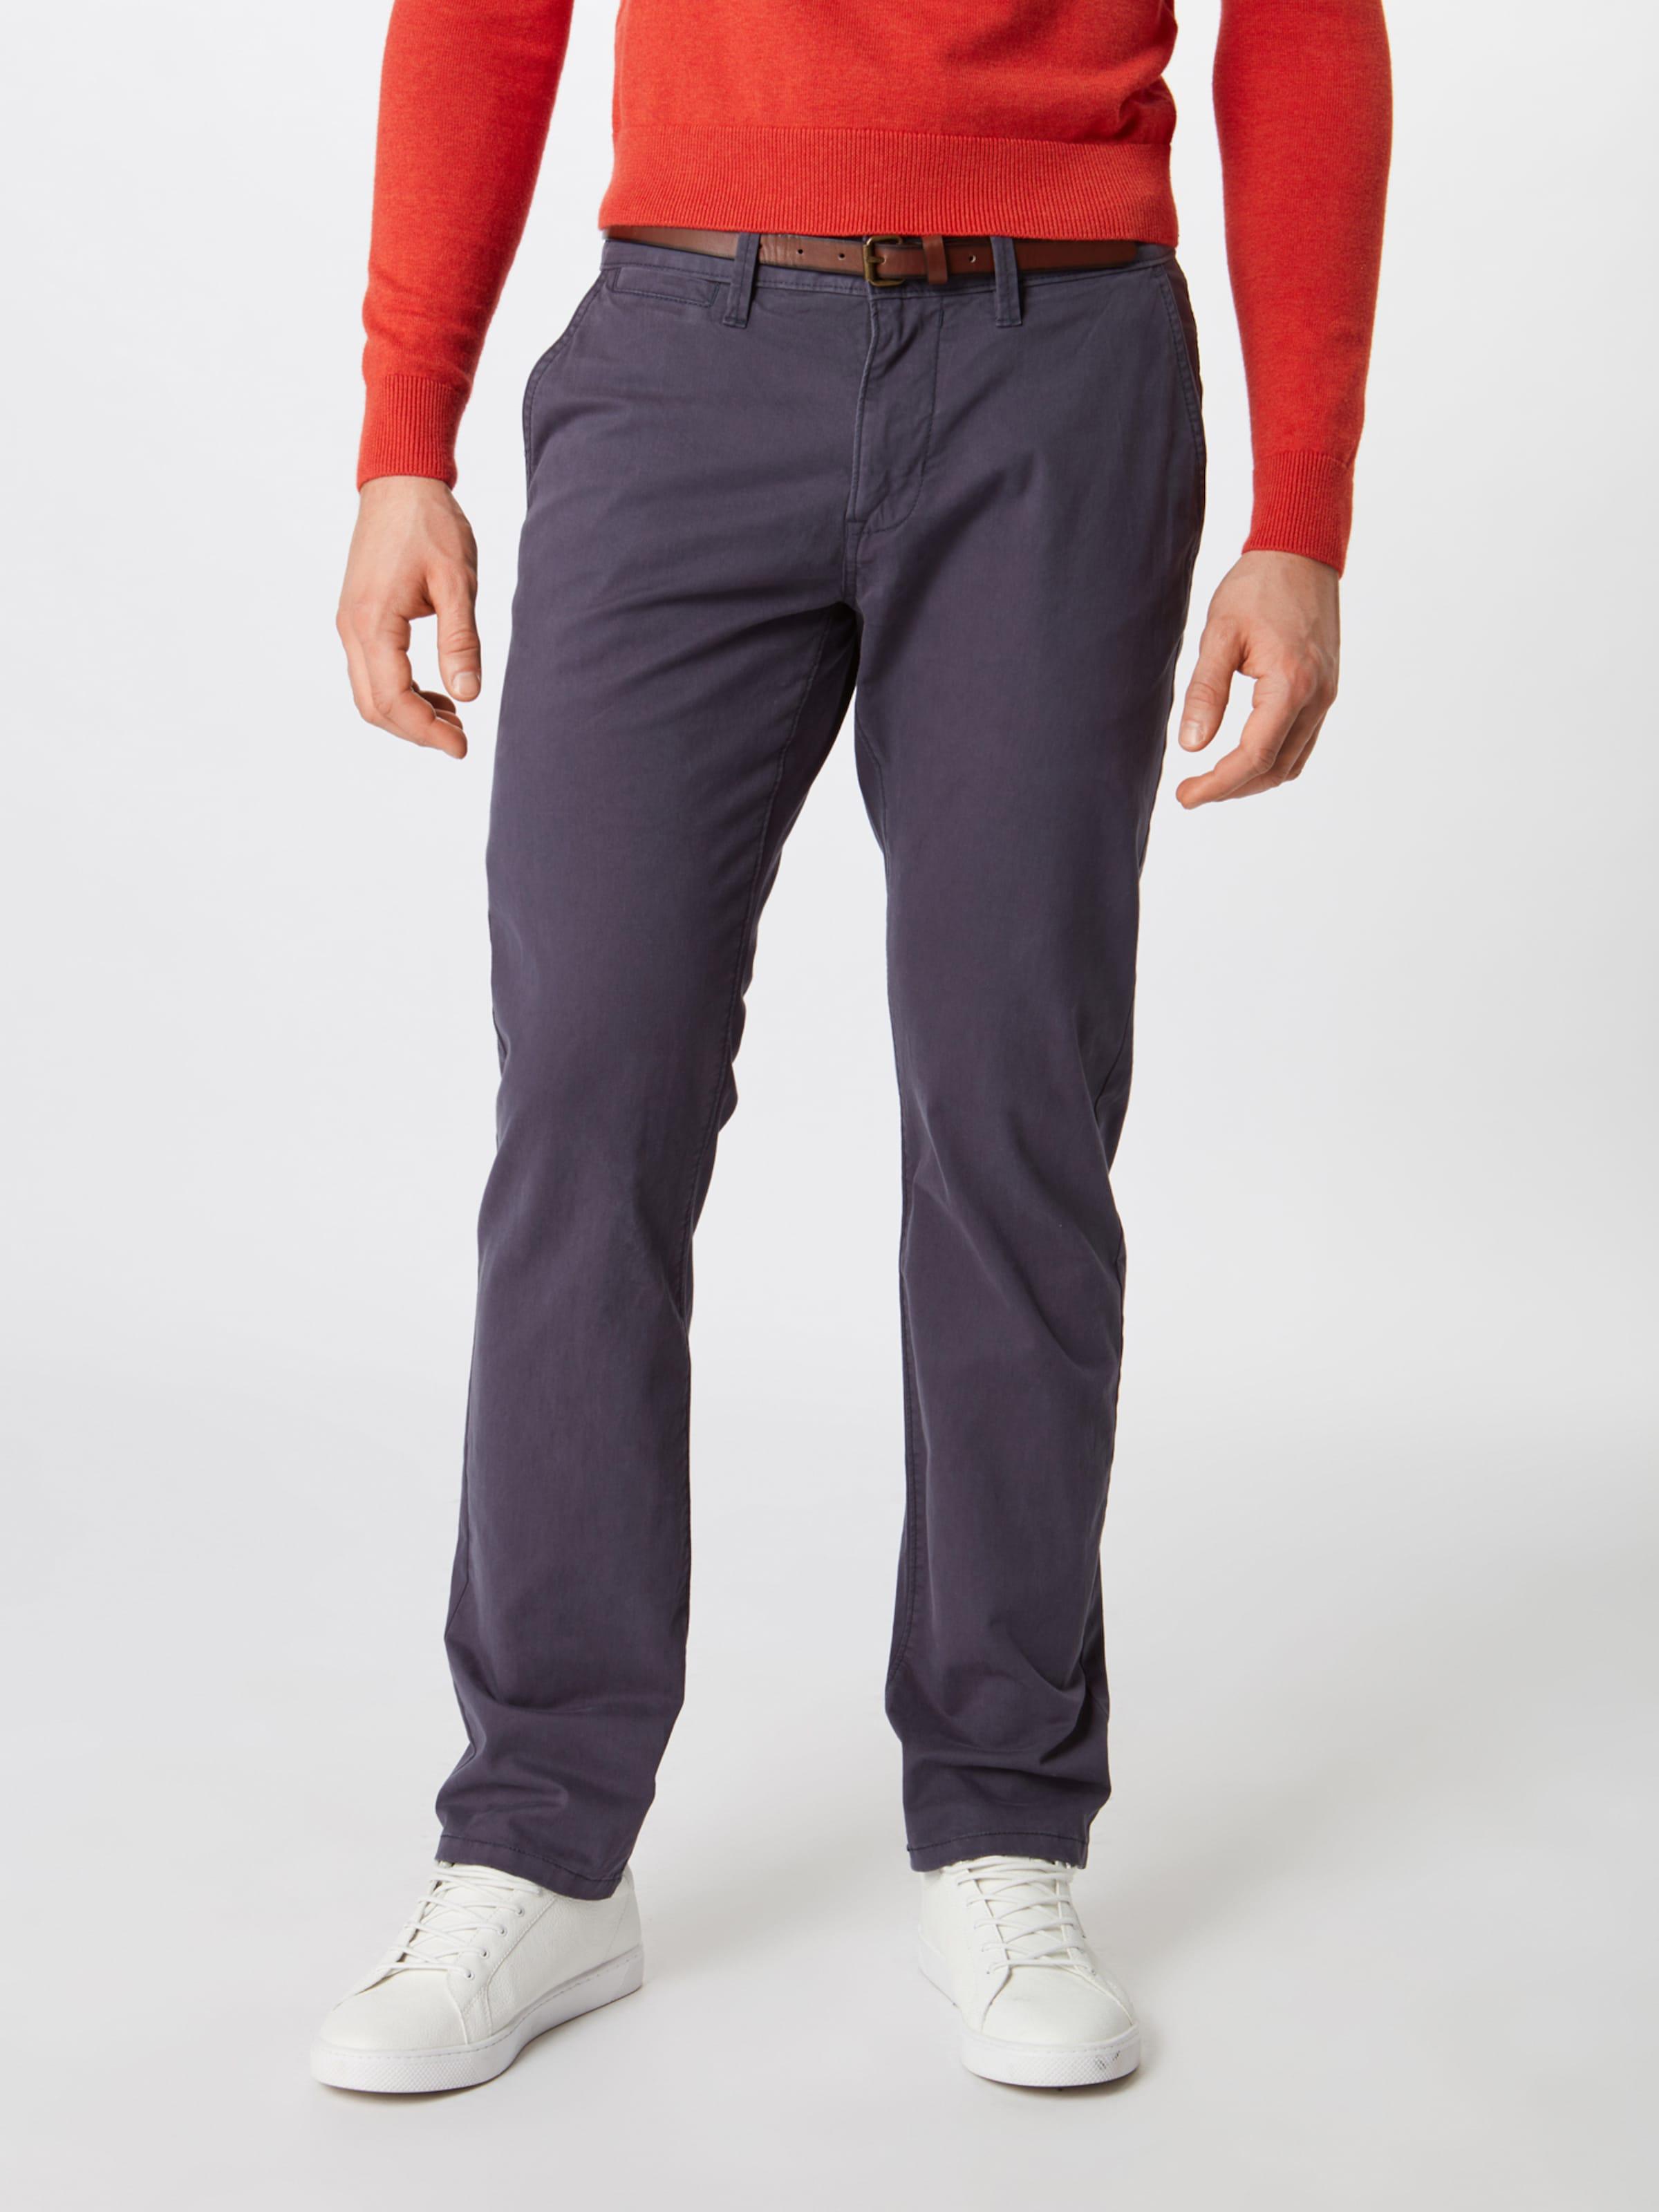 Tom Chino' En Violet Tailor 'essential Foncé Pantalon nm8wN0